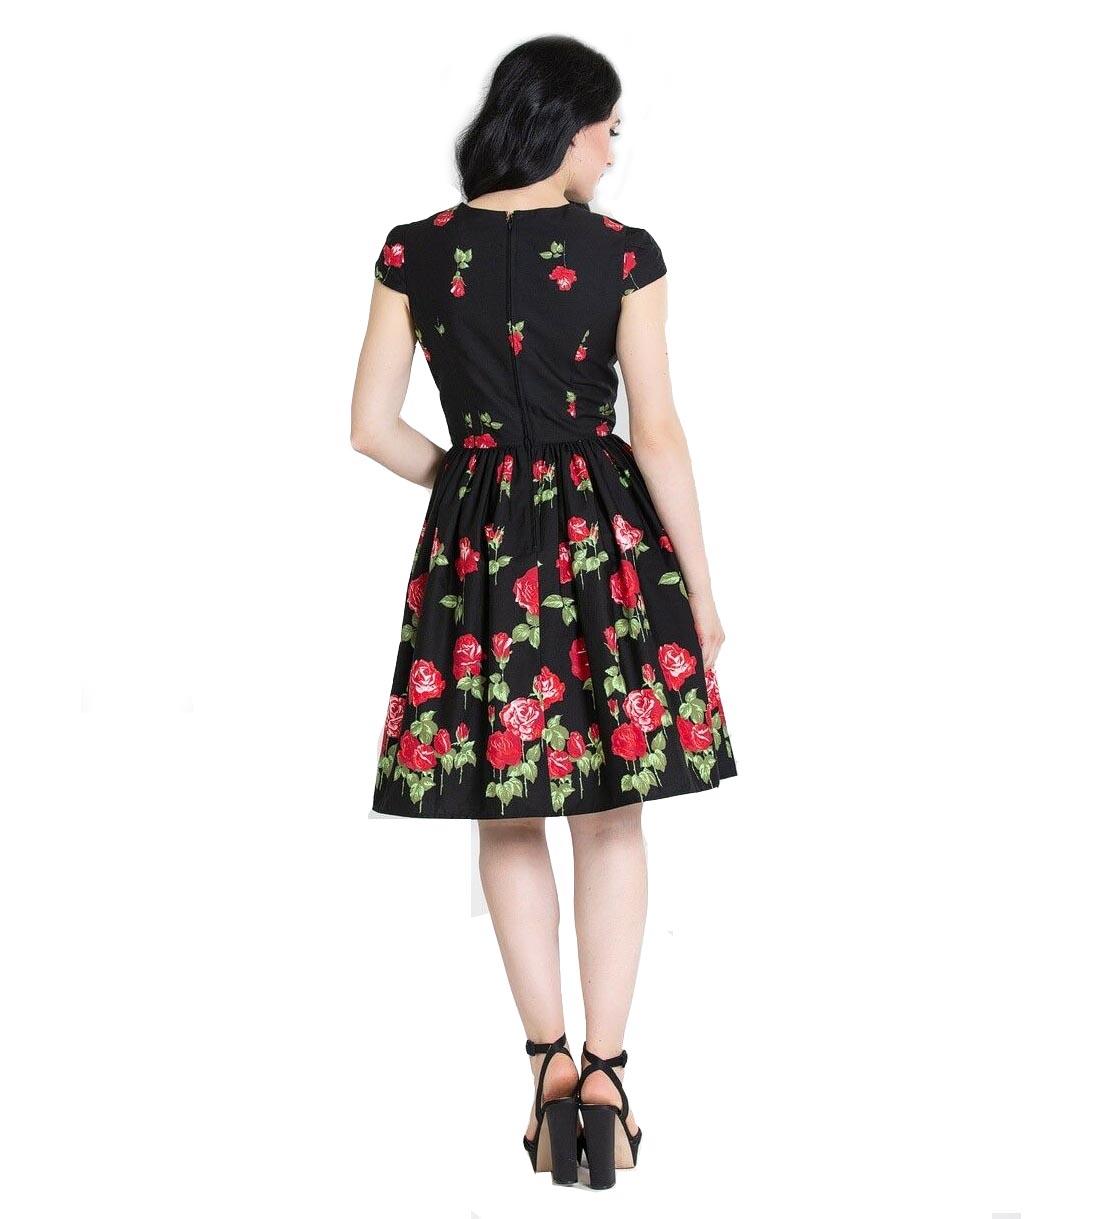 Hell-Bunny-Pin-Up-Mid-Length-50s-Dress-ANTONIA-Rose-Floral-Black thumbnail 5